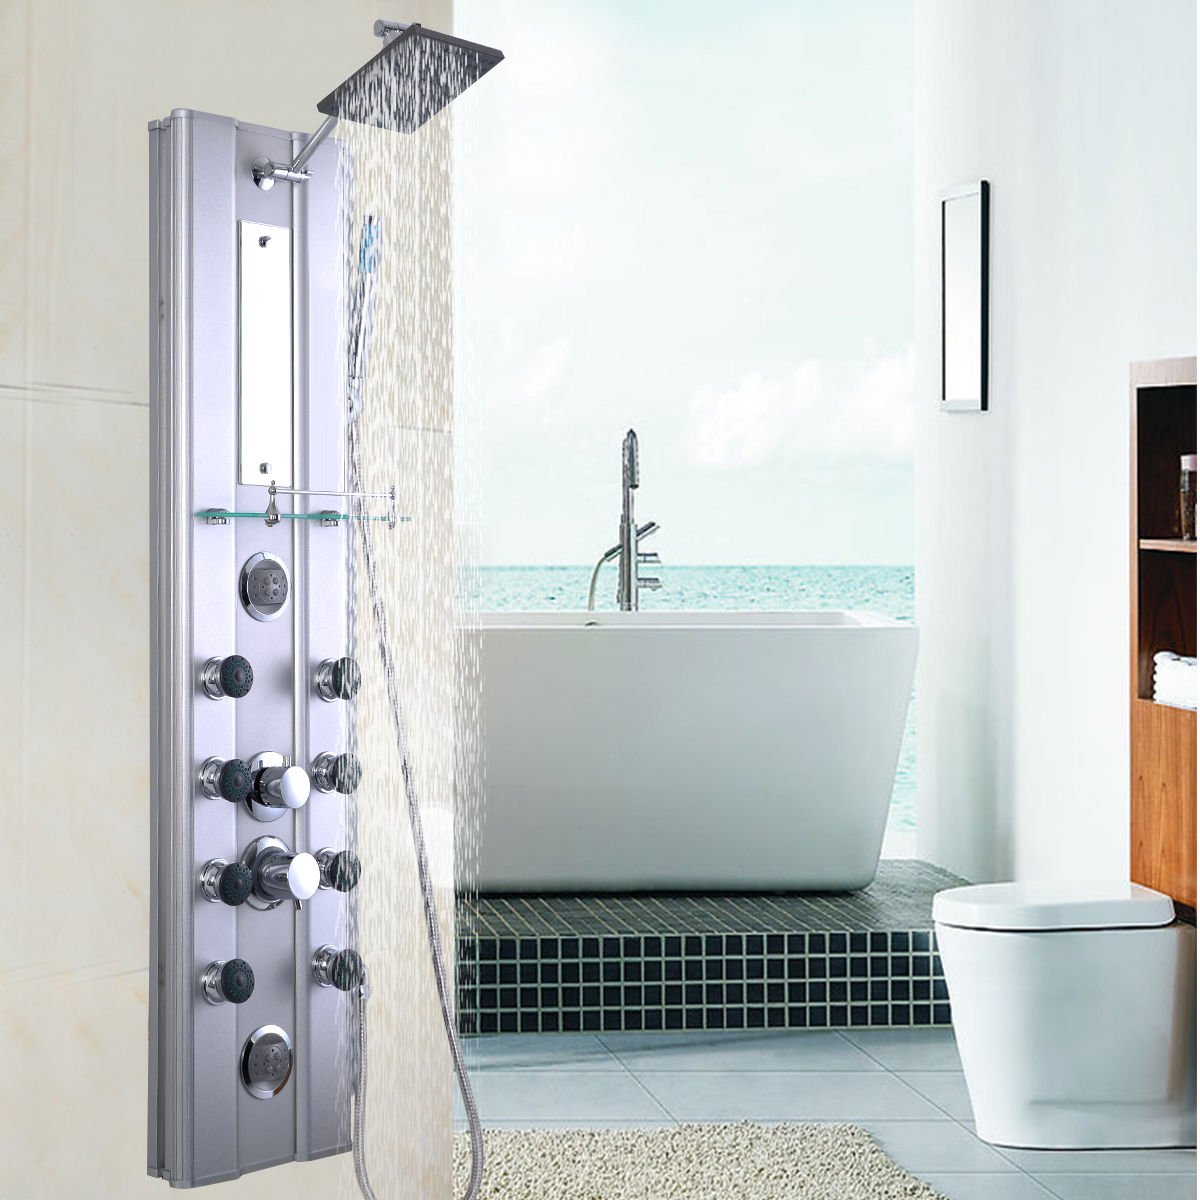 Giantex Shower Panel Rainfall Waterfall Shower Head Massage System ...